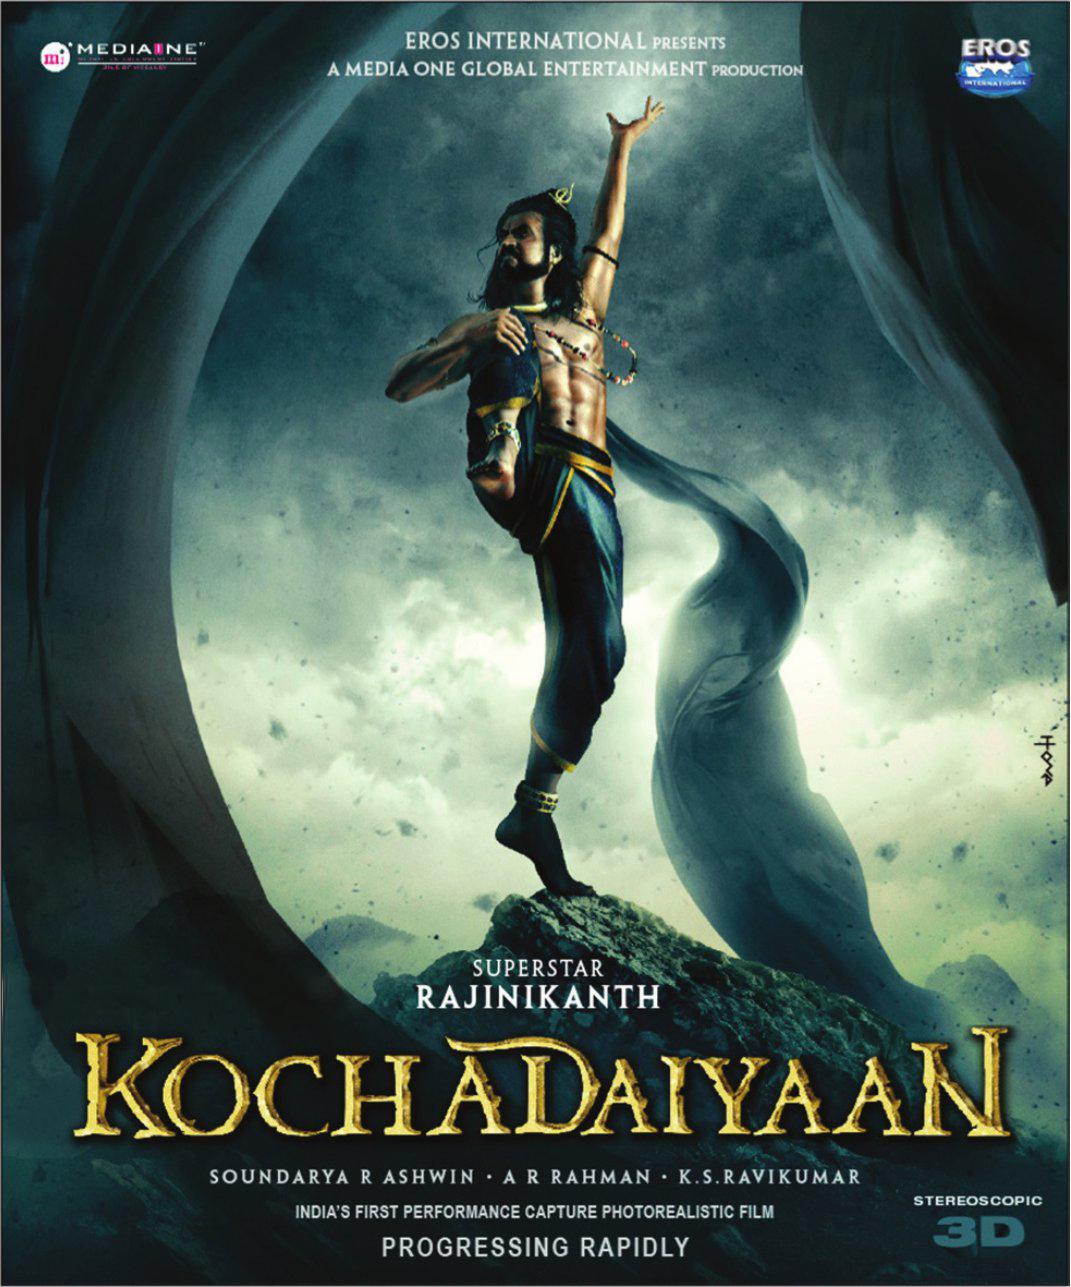 'Kochadaiyaan' Is With A Quality Of Avatar And Tin Tin